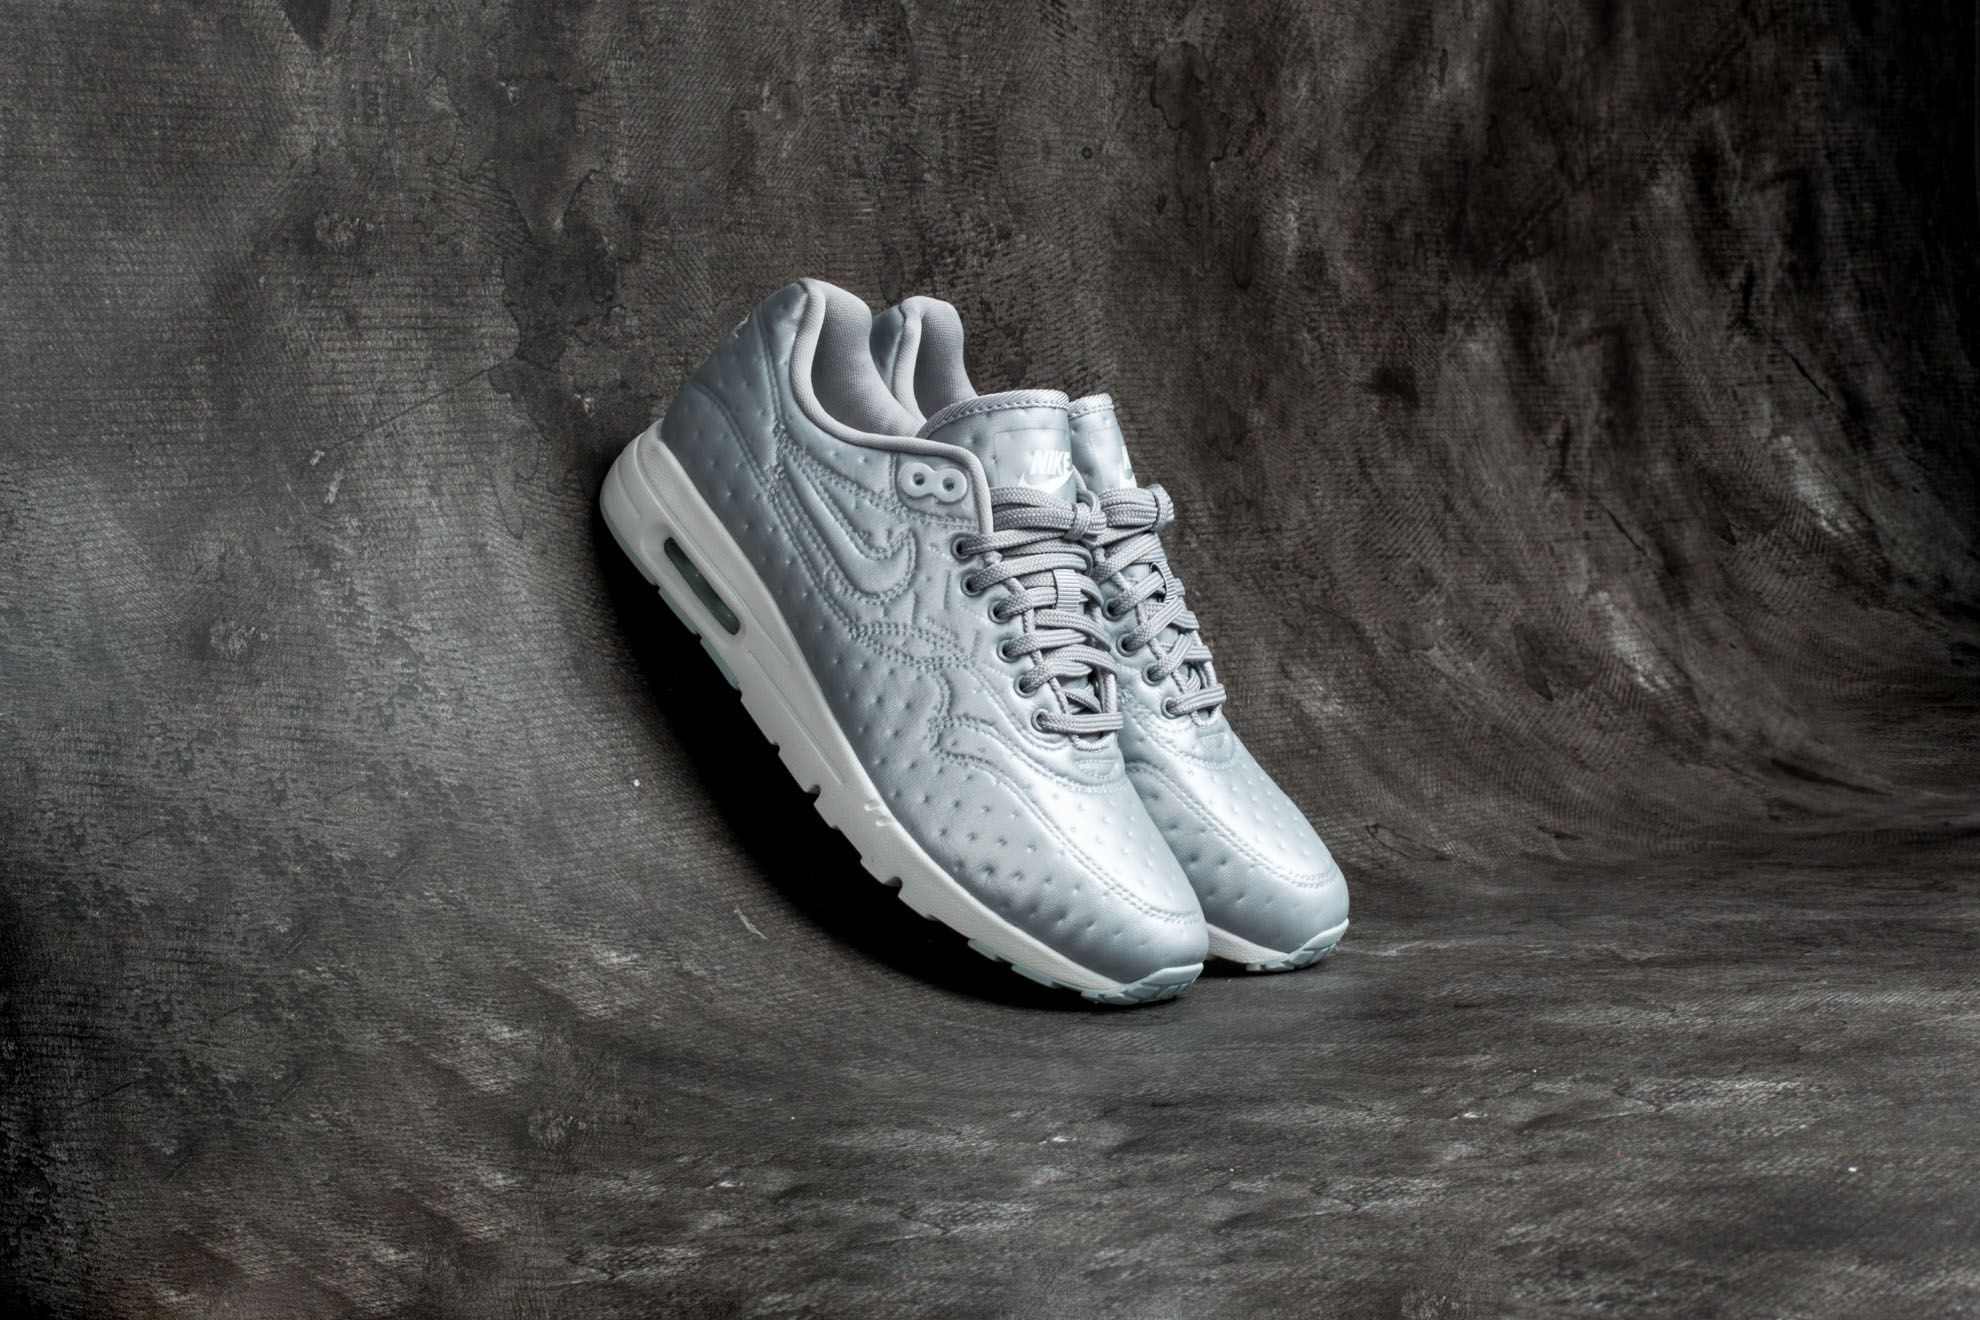 Nike W Air Max 1 Ultra Premium Jacquard Metallic Silver Matte Silver | Footshop